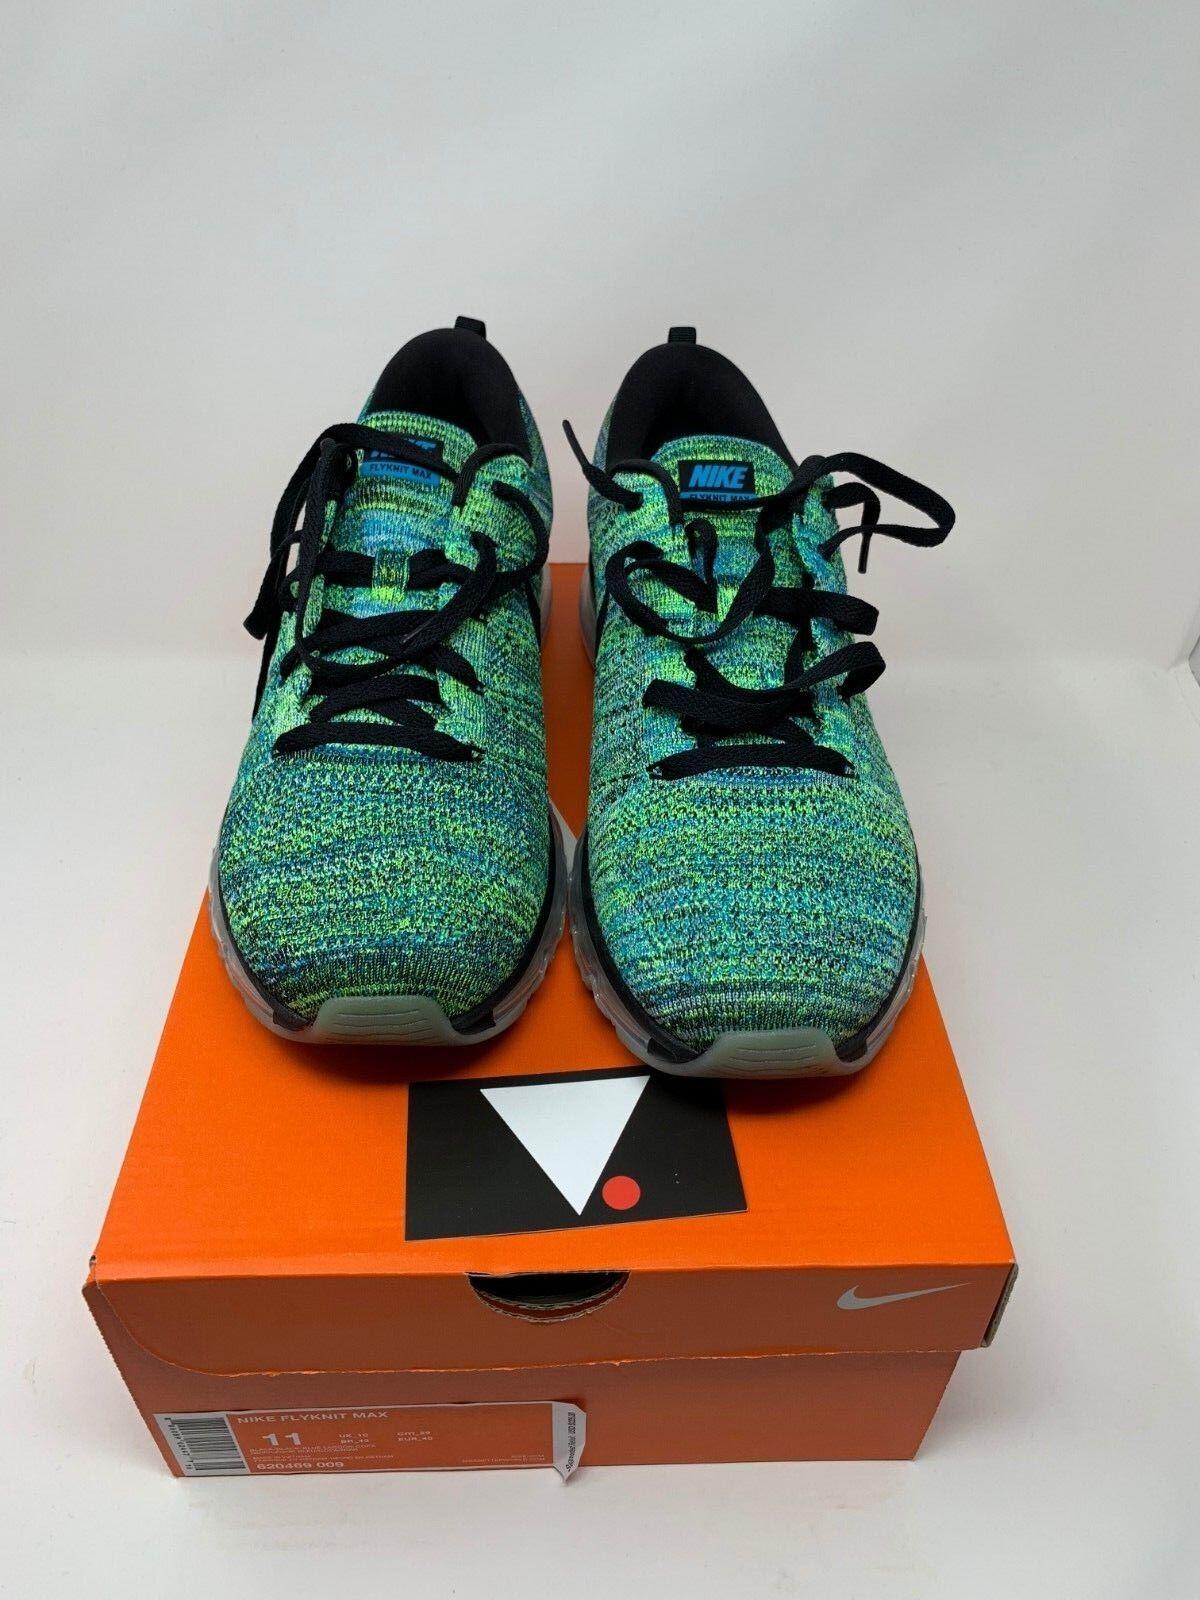 0147b6f466 Nike Flyknit Max Black bluee Lagoon 620469 009 OFF WHITE REACT VAPORMAX